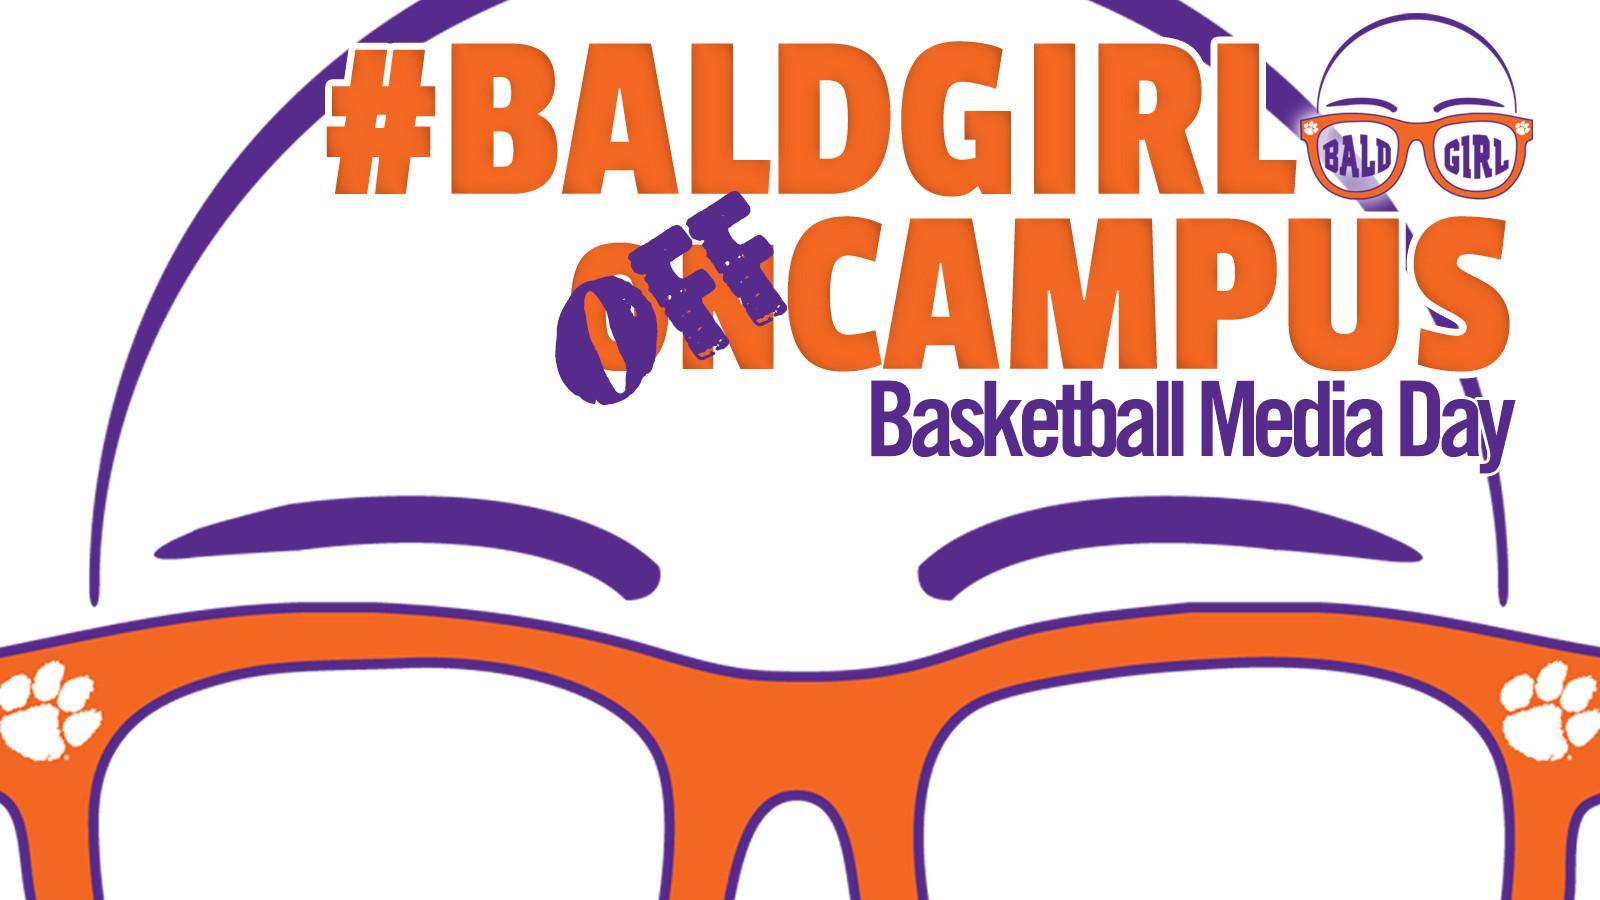 ClemsonTigers.com's Bald Girl on Campus: Basketball Media Day